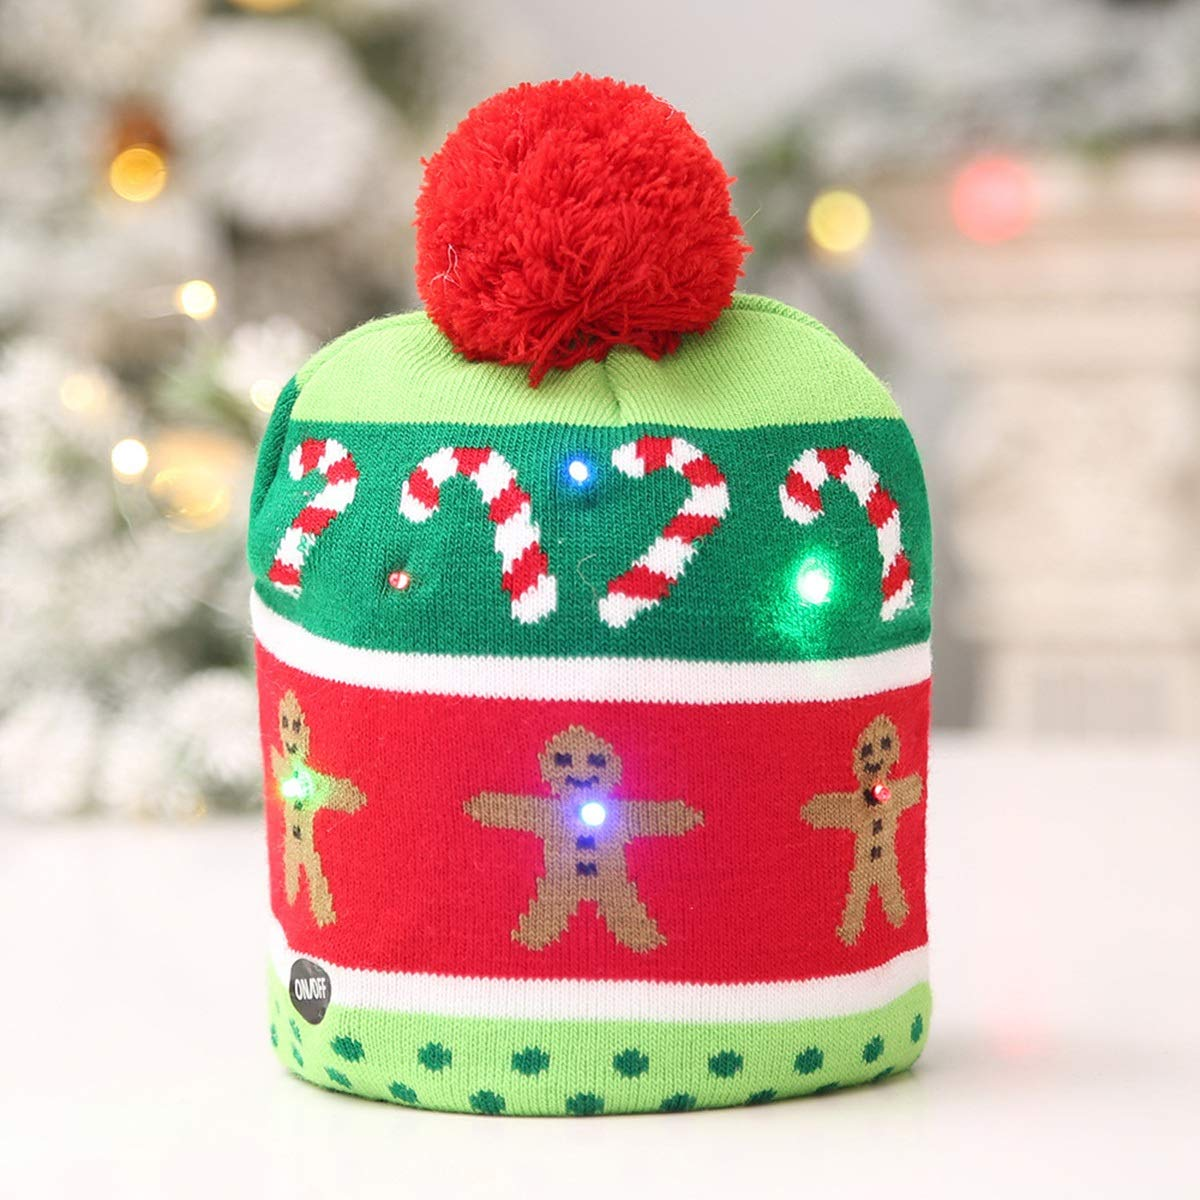 Precioso Sombrero navideño Gorras LED Papá Noel Copo de Nieve ...